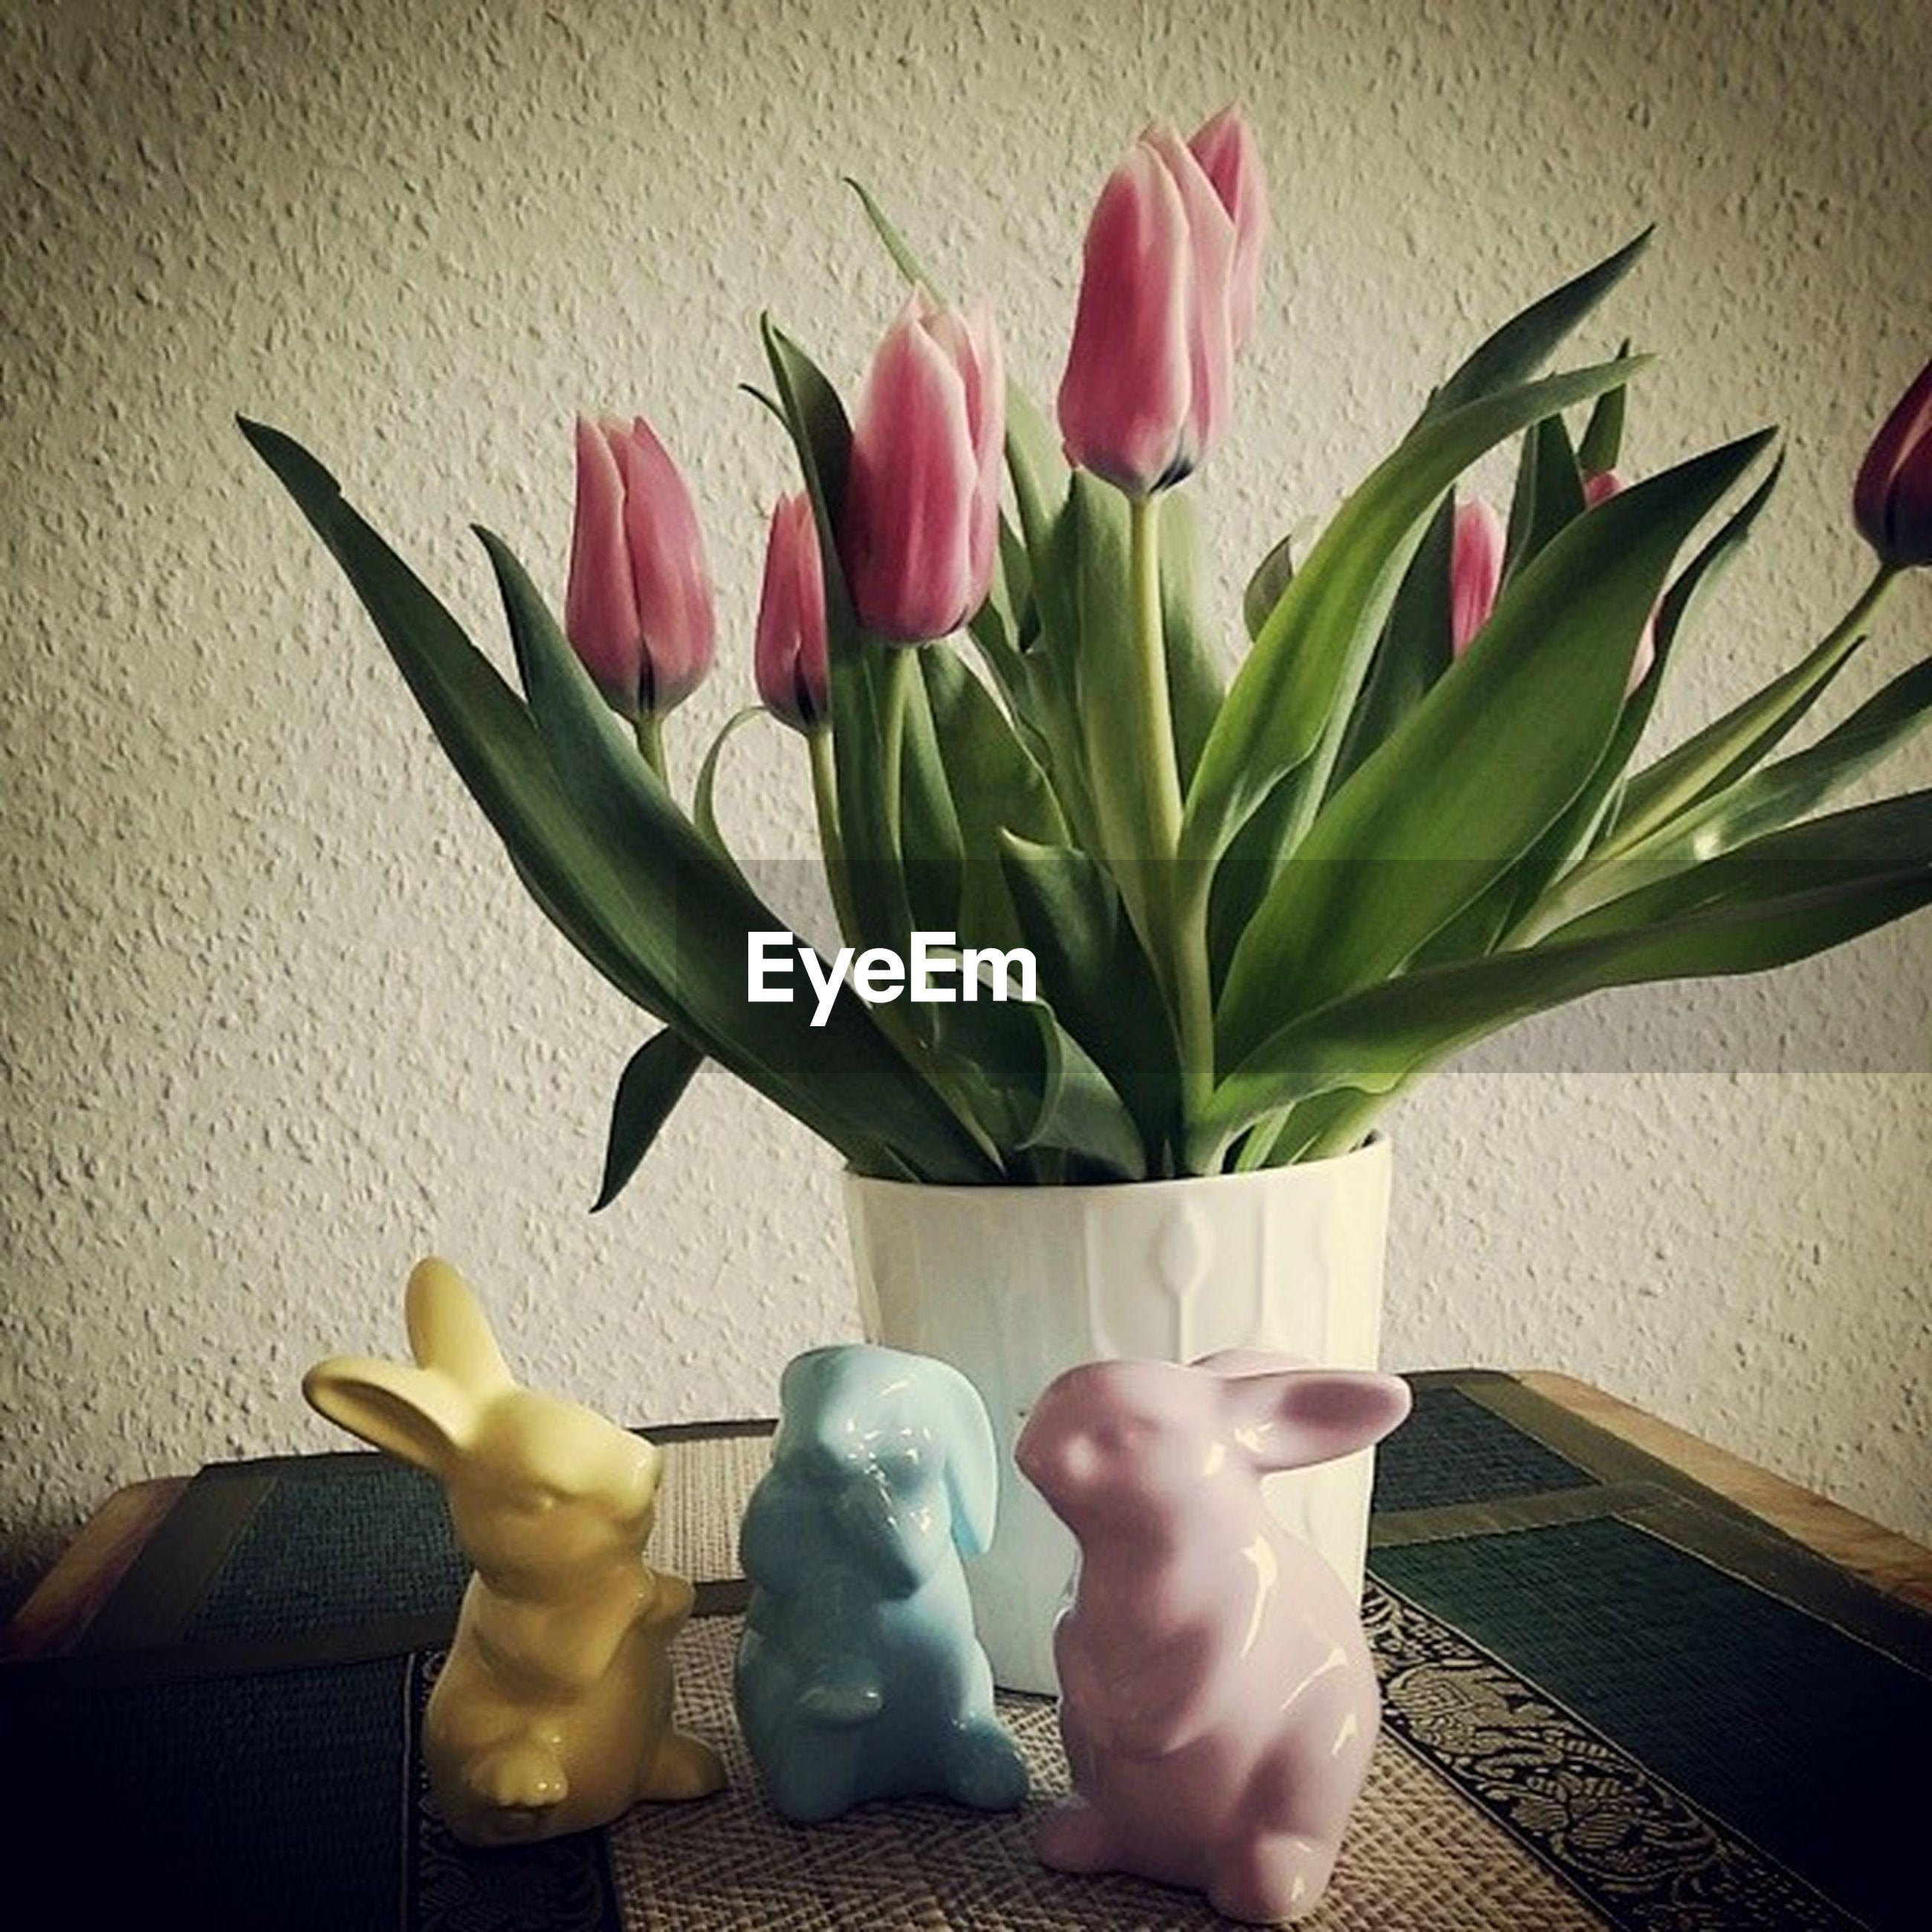 flower, indoors, freshness, vase, petal, fragility, flower head, table, tulip, flower arrangement, leaf, potted plant, pink color, wall - building feature, home interior, plant, rose - flower, bouquet, stem, growth